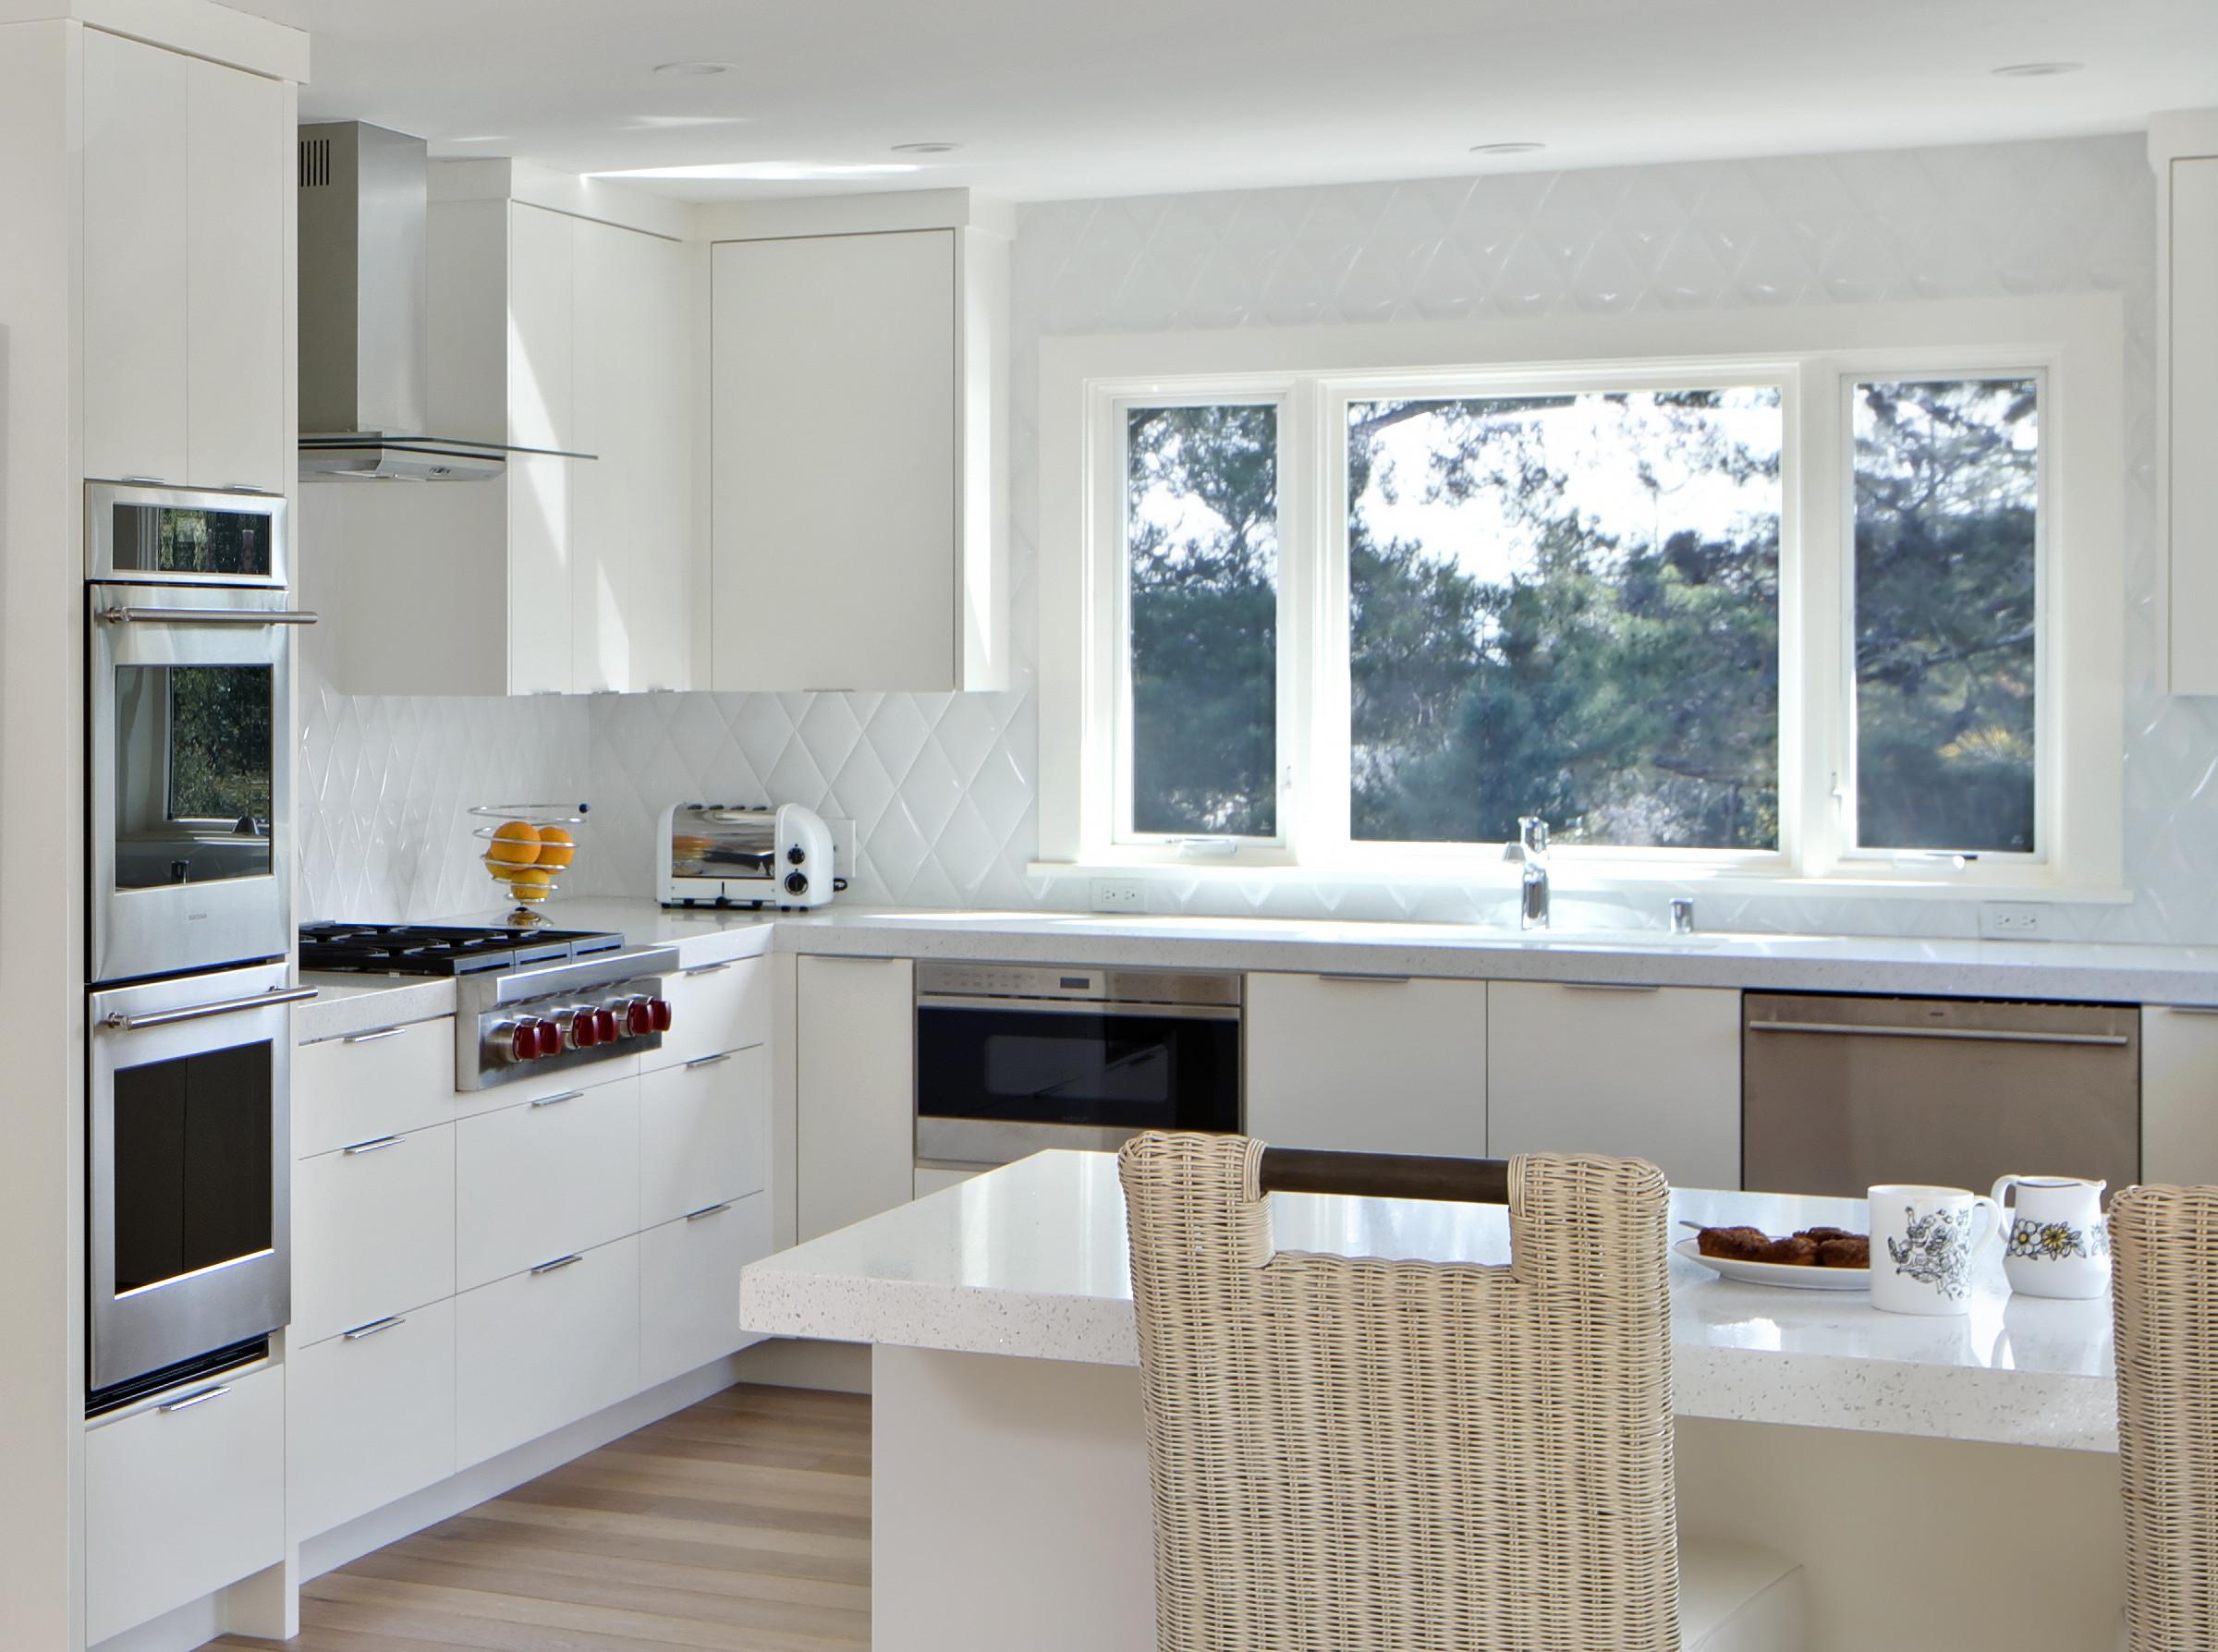 El Arroyo - modern kitchen